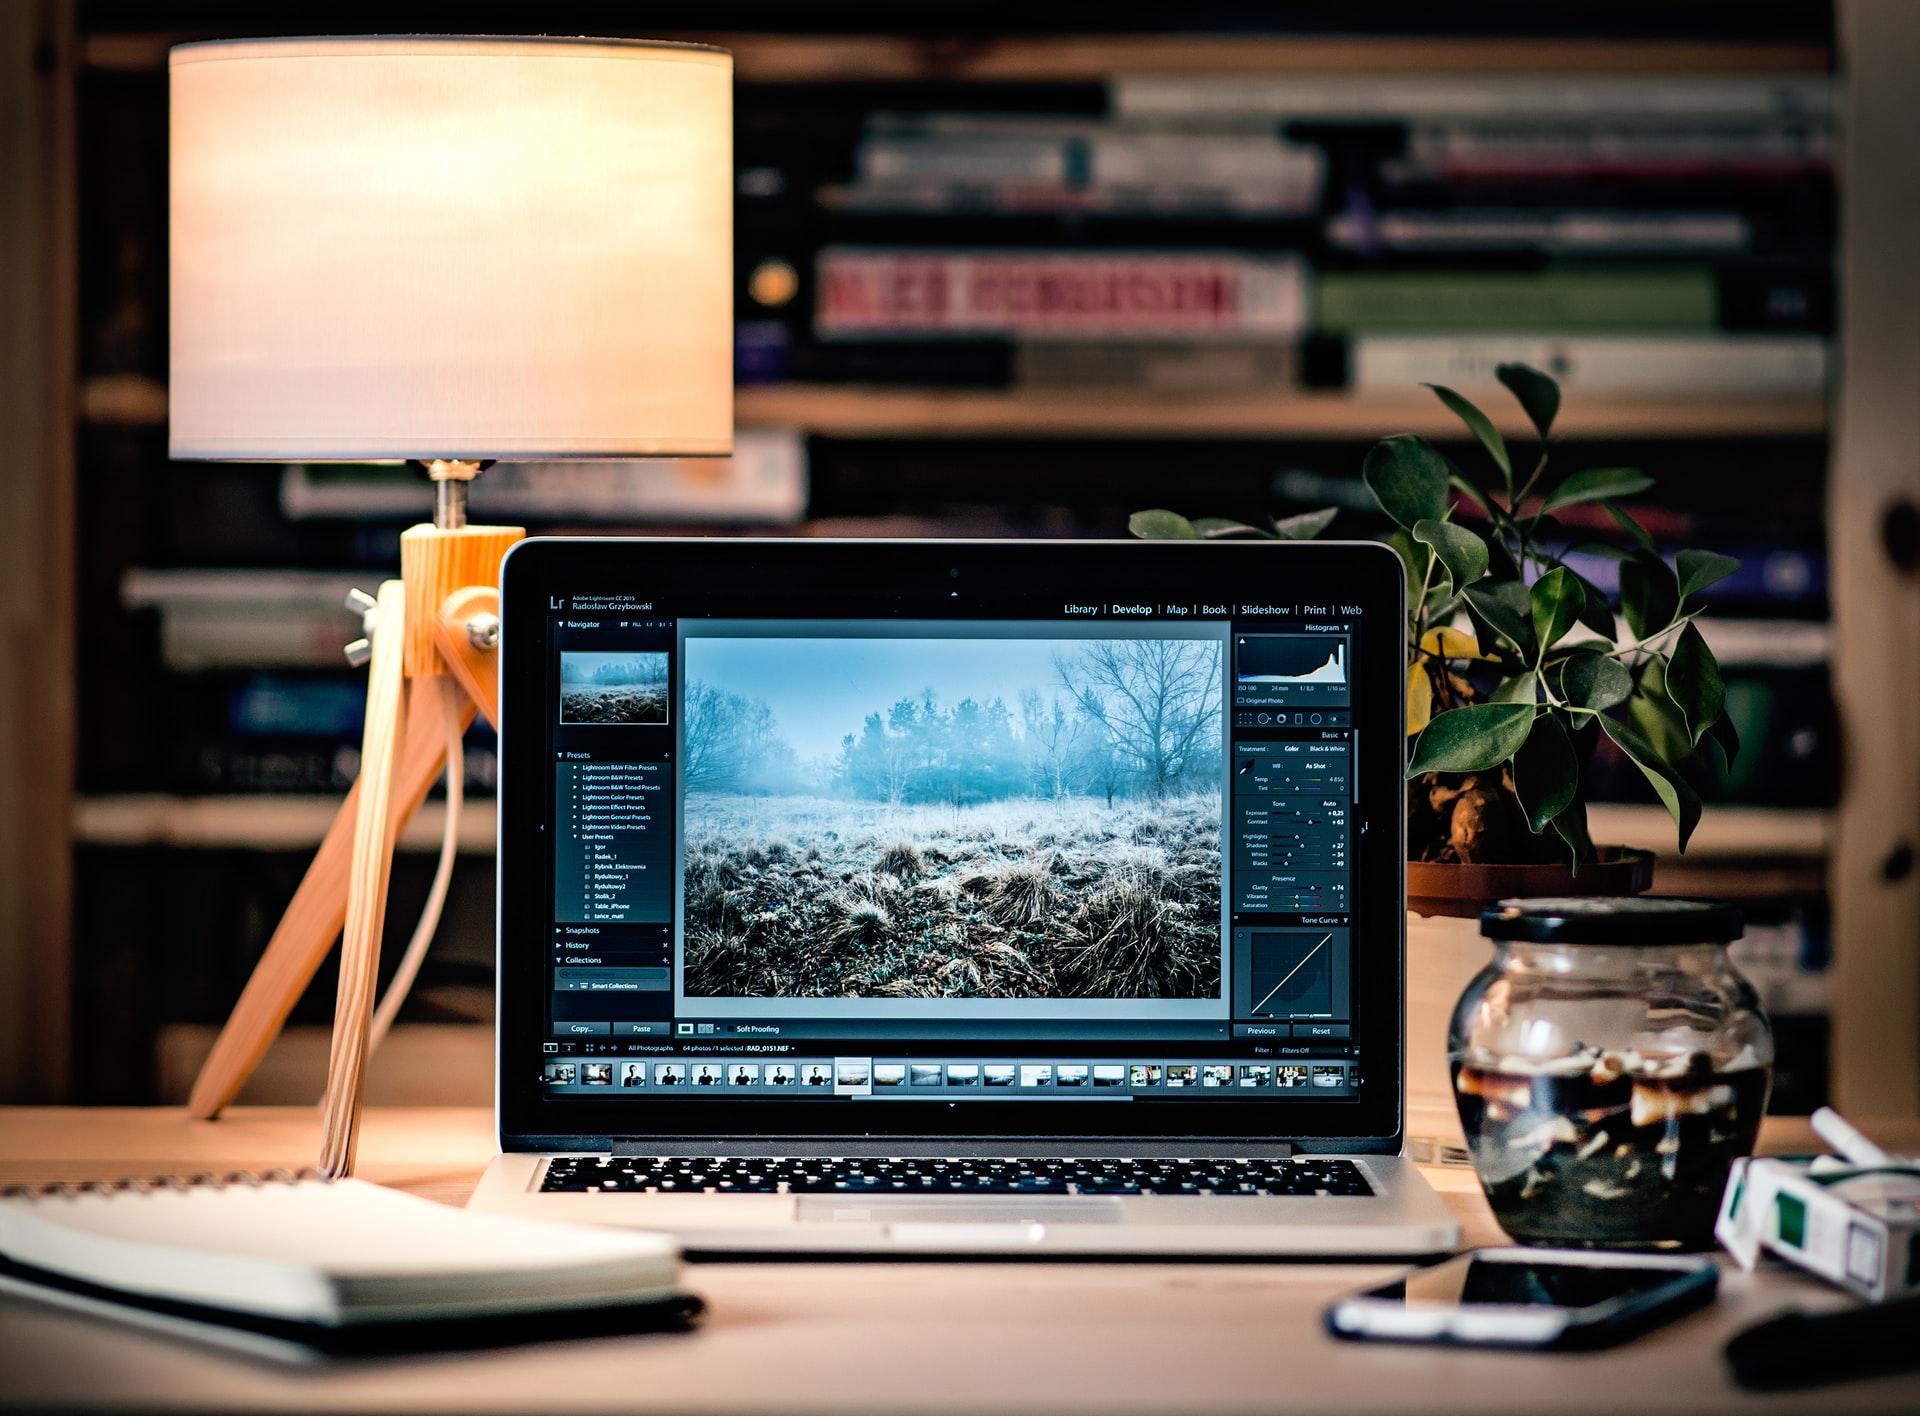 Premiere Proで動画サイズを変更するには?3つの方法を紹介!